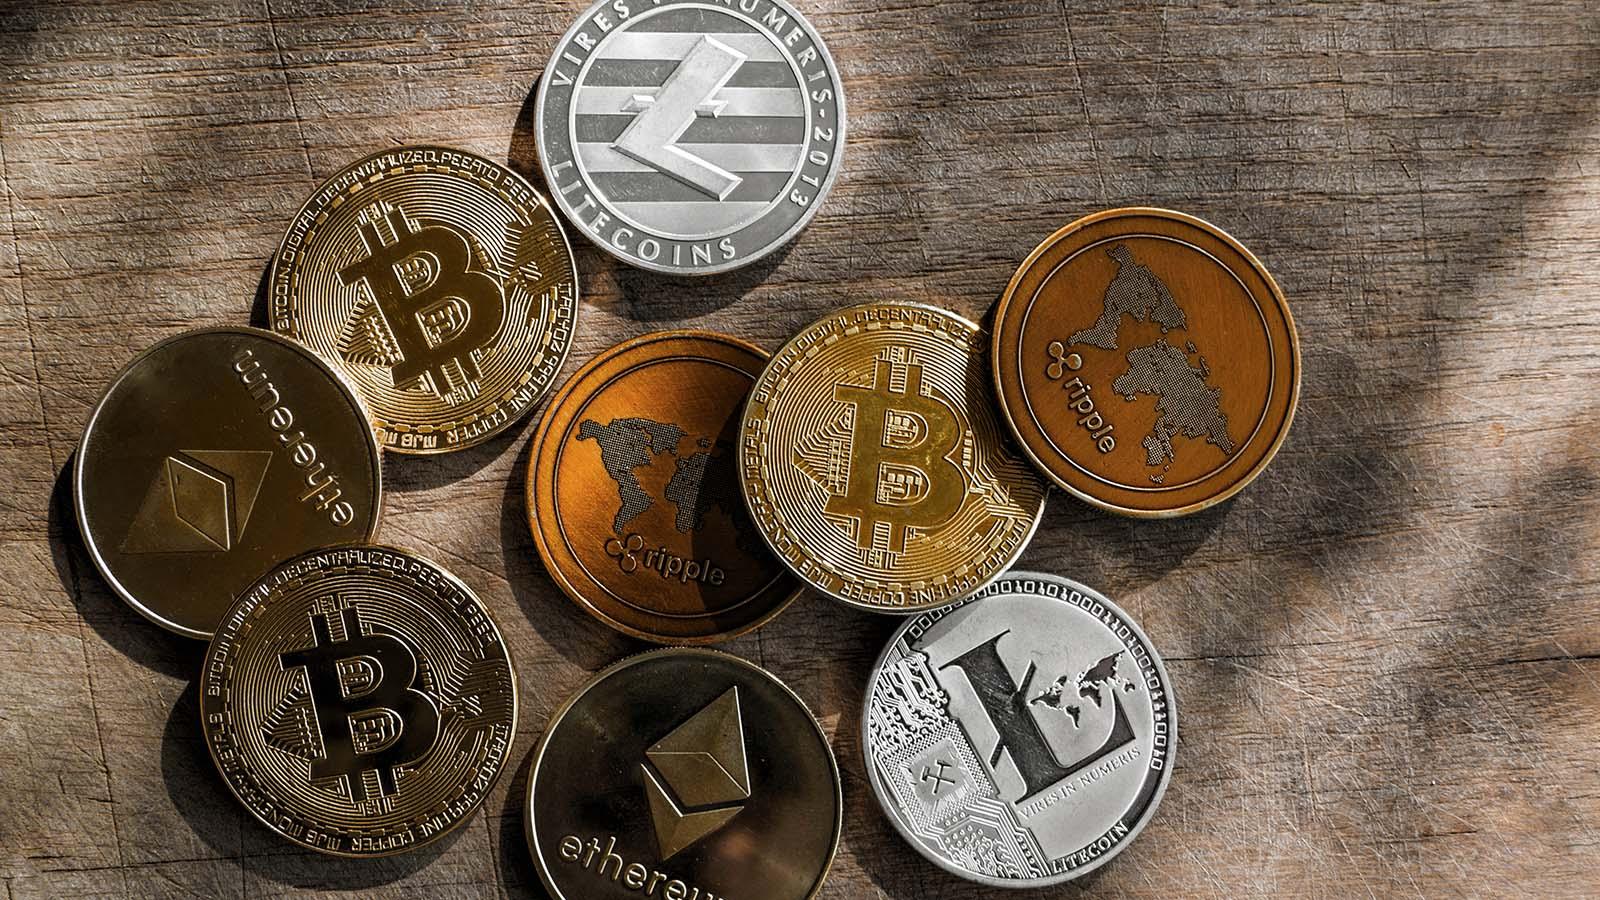 5 Top Cryptocurrency To Buy This Week [BTC,ADA, YFI, SOL, FIL] August 2021 Week 1 - InsideBitcoins.com